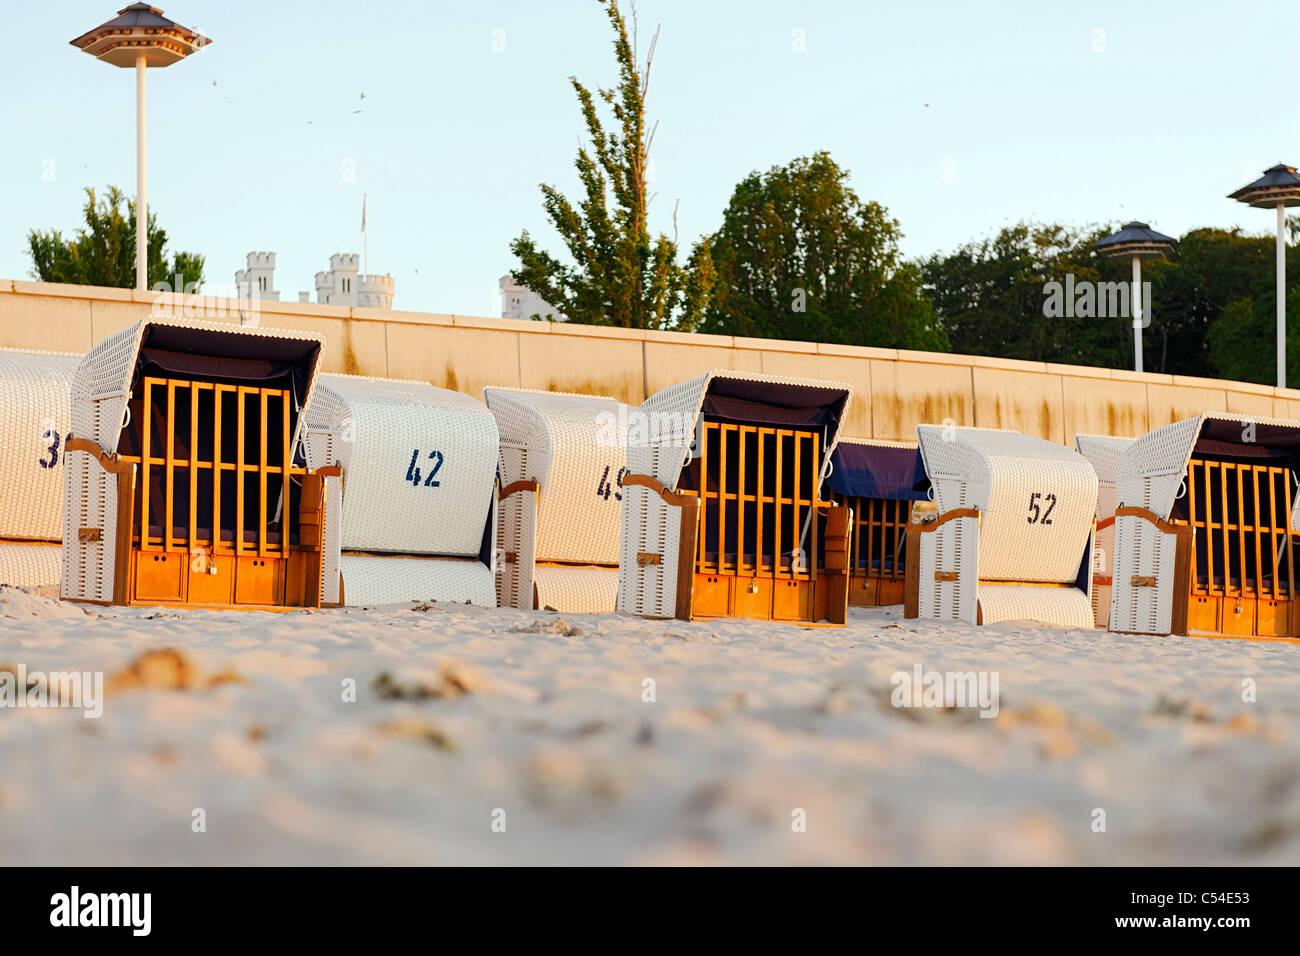 Roofed wicker beach chairs, beach, Baltic Sea, sunset, seaside resort of Ostseeheilbad Heiligendamm, Germany - Stock Image